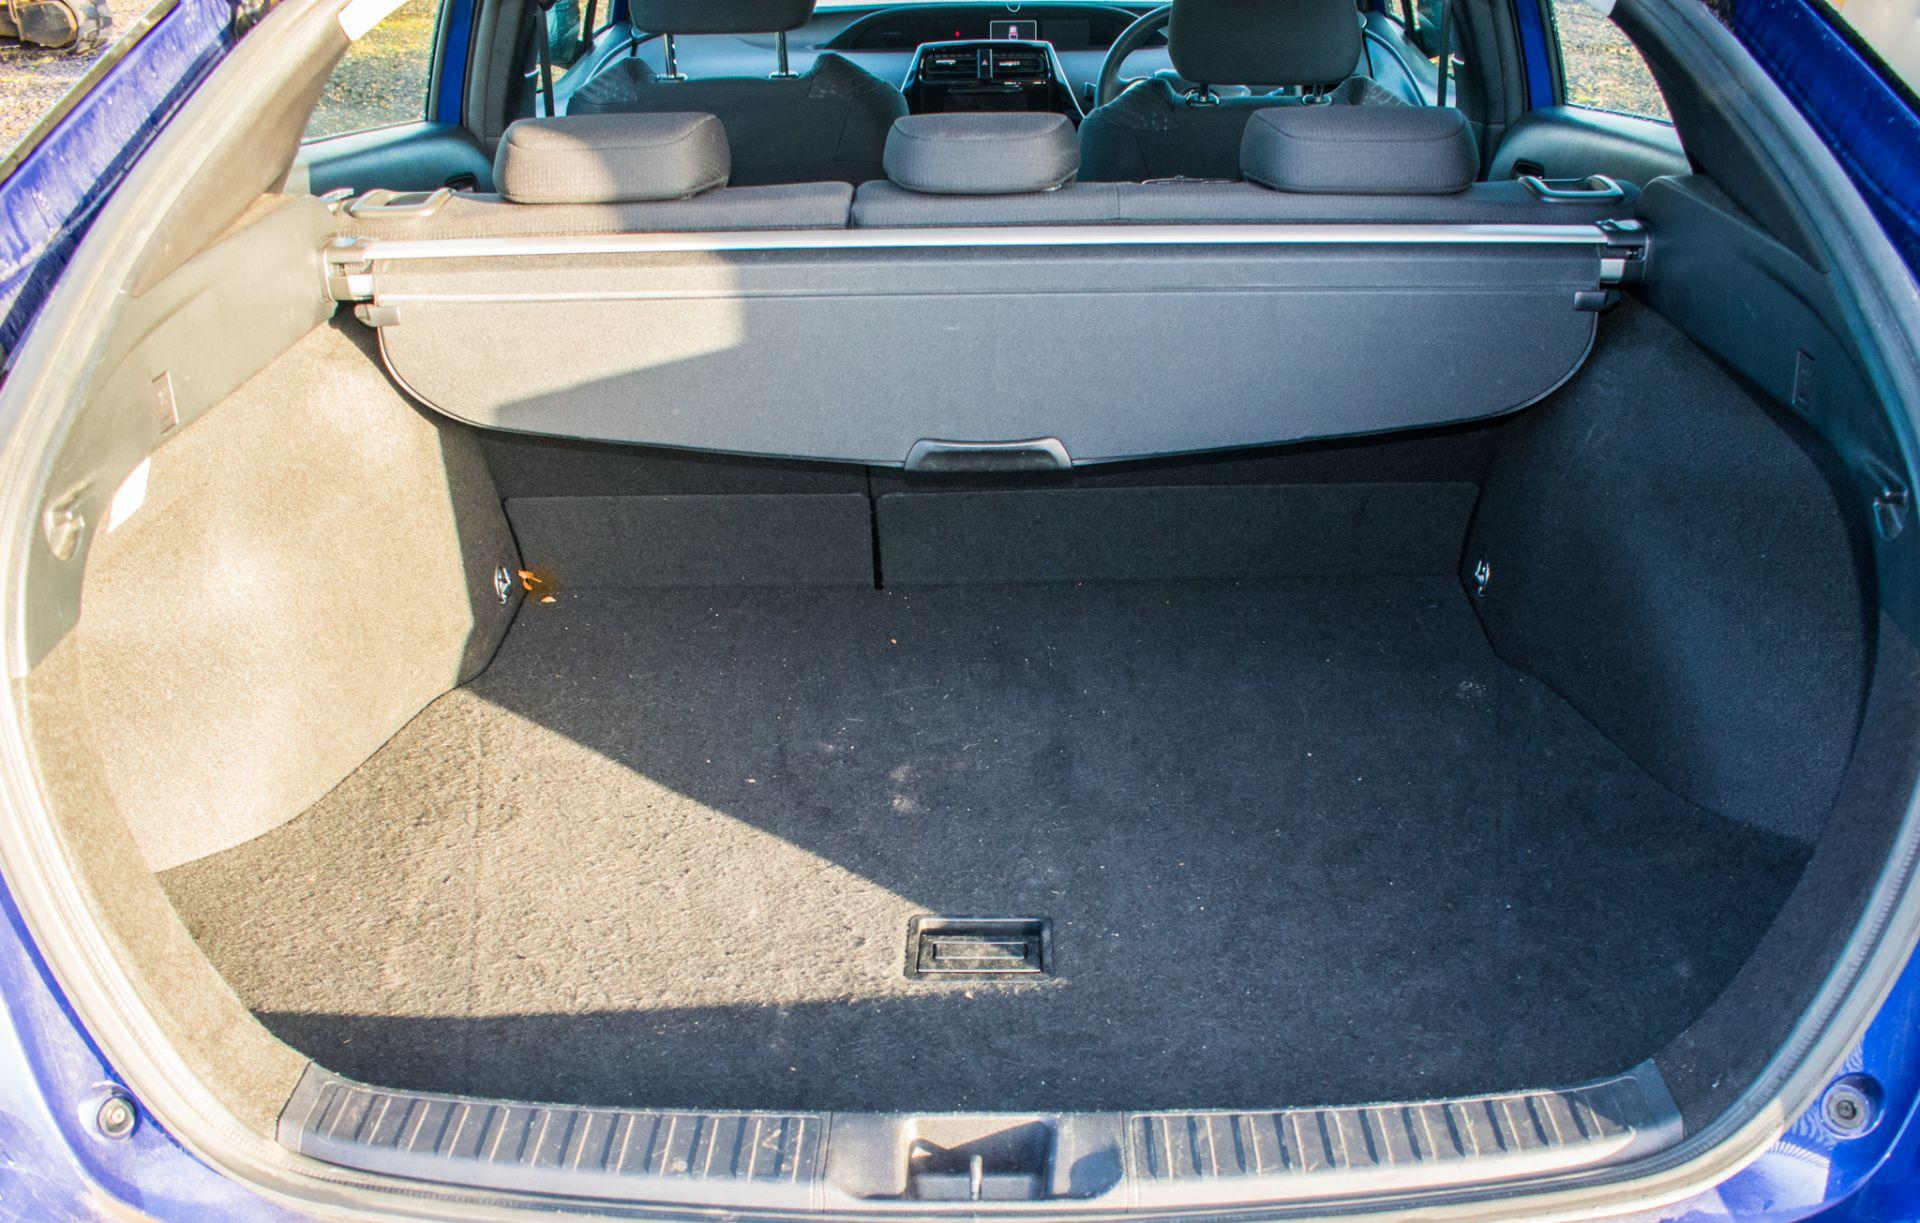 ToyotaPrius ActiveHybrid Electric 5 doorHatchback  Registration Number: LM67 OKH Date of First - Image 17 of 17